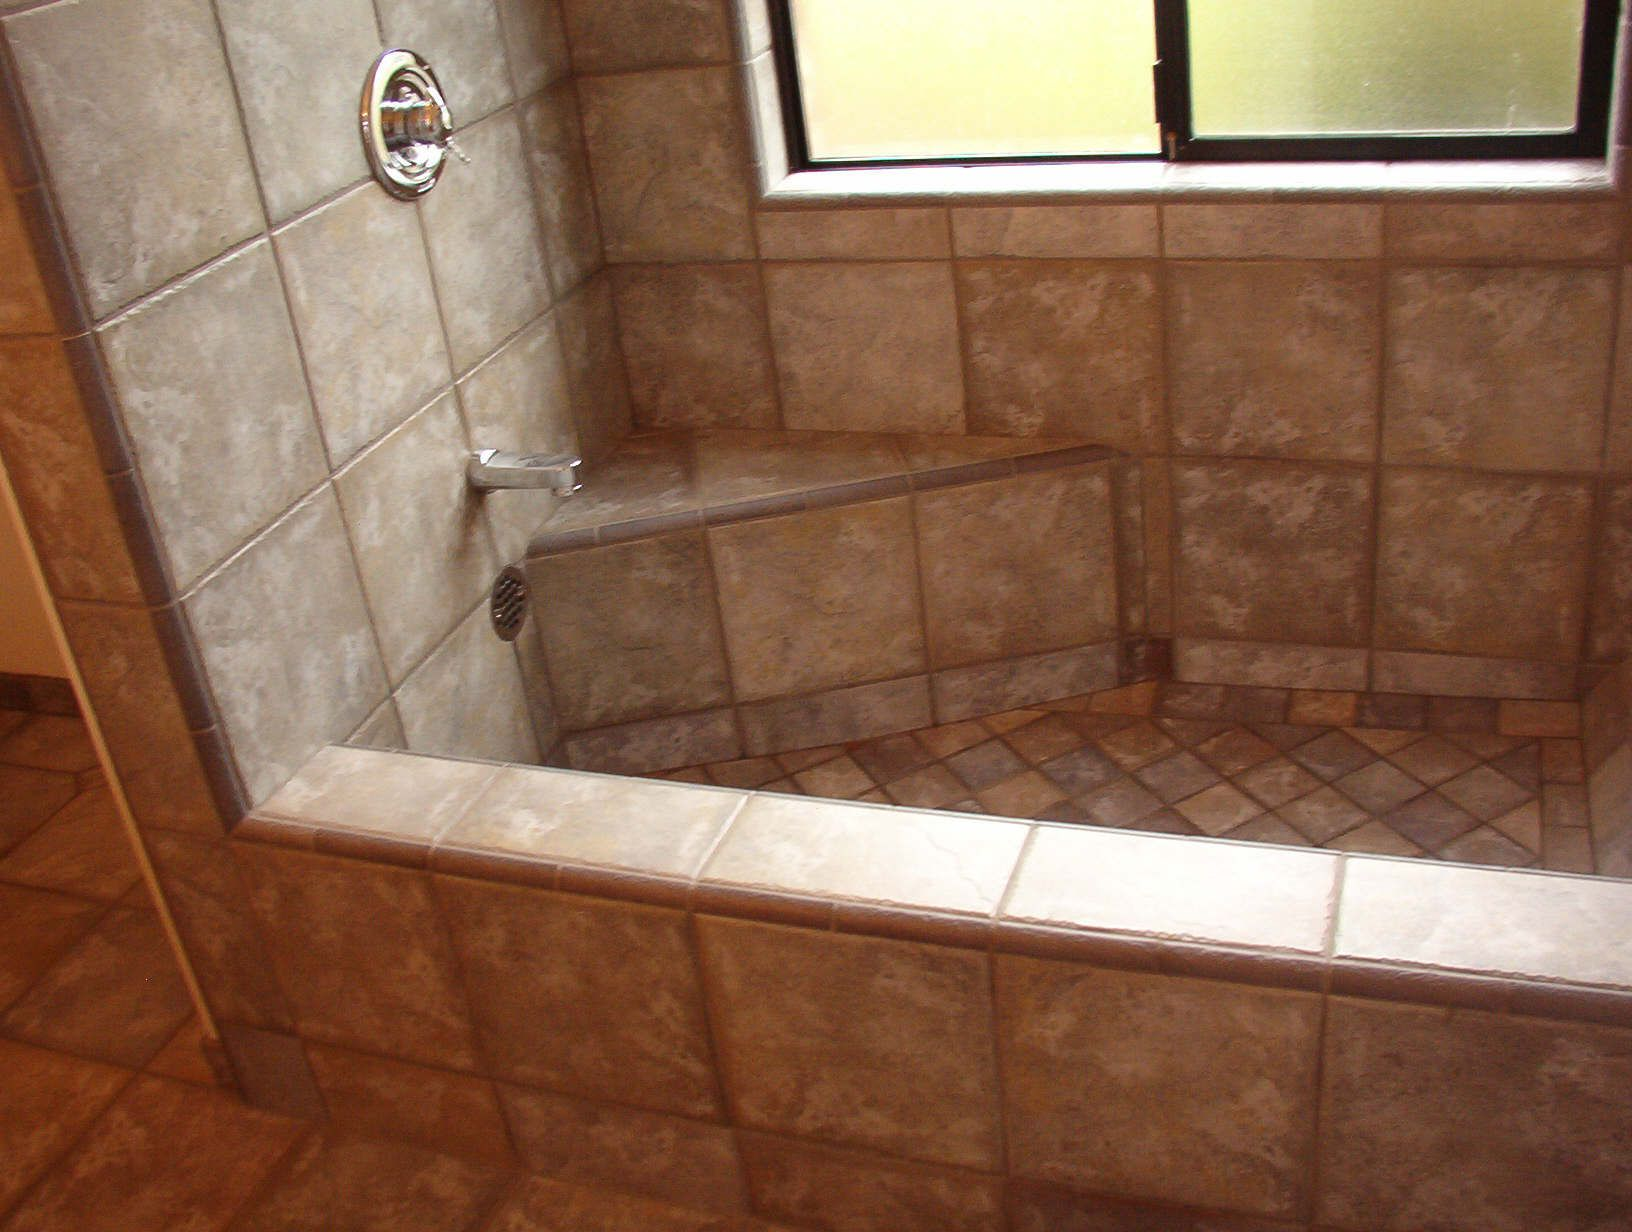 Roman Bathtub Ideas - http://totrodz.com/roman-bathtub ...